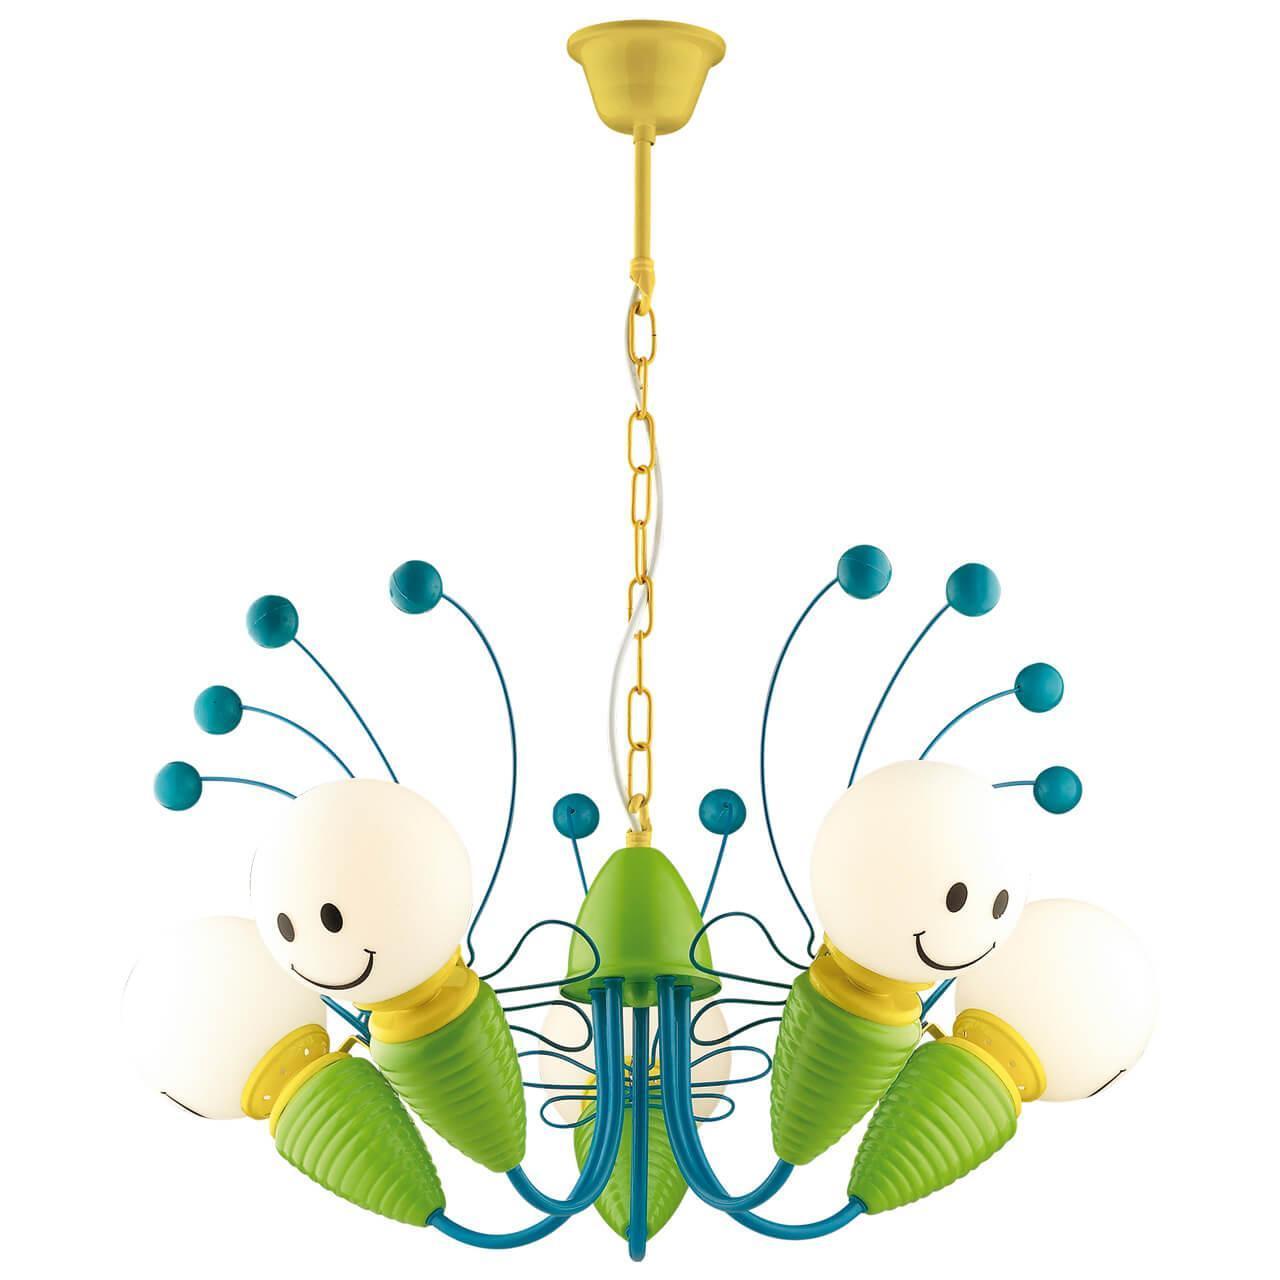 Подвесной светильник Odeon Light 2633/5, E14, 40 Вт odeon light 2633 1w odl14 737 зел син желтый бра с выкл e14 40w 220v trolo